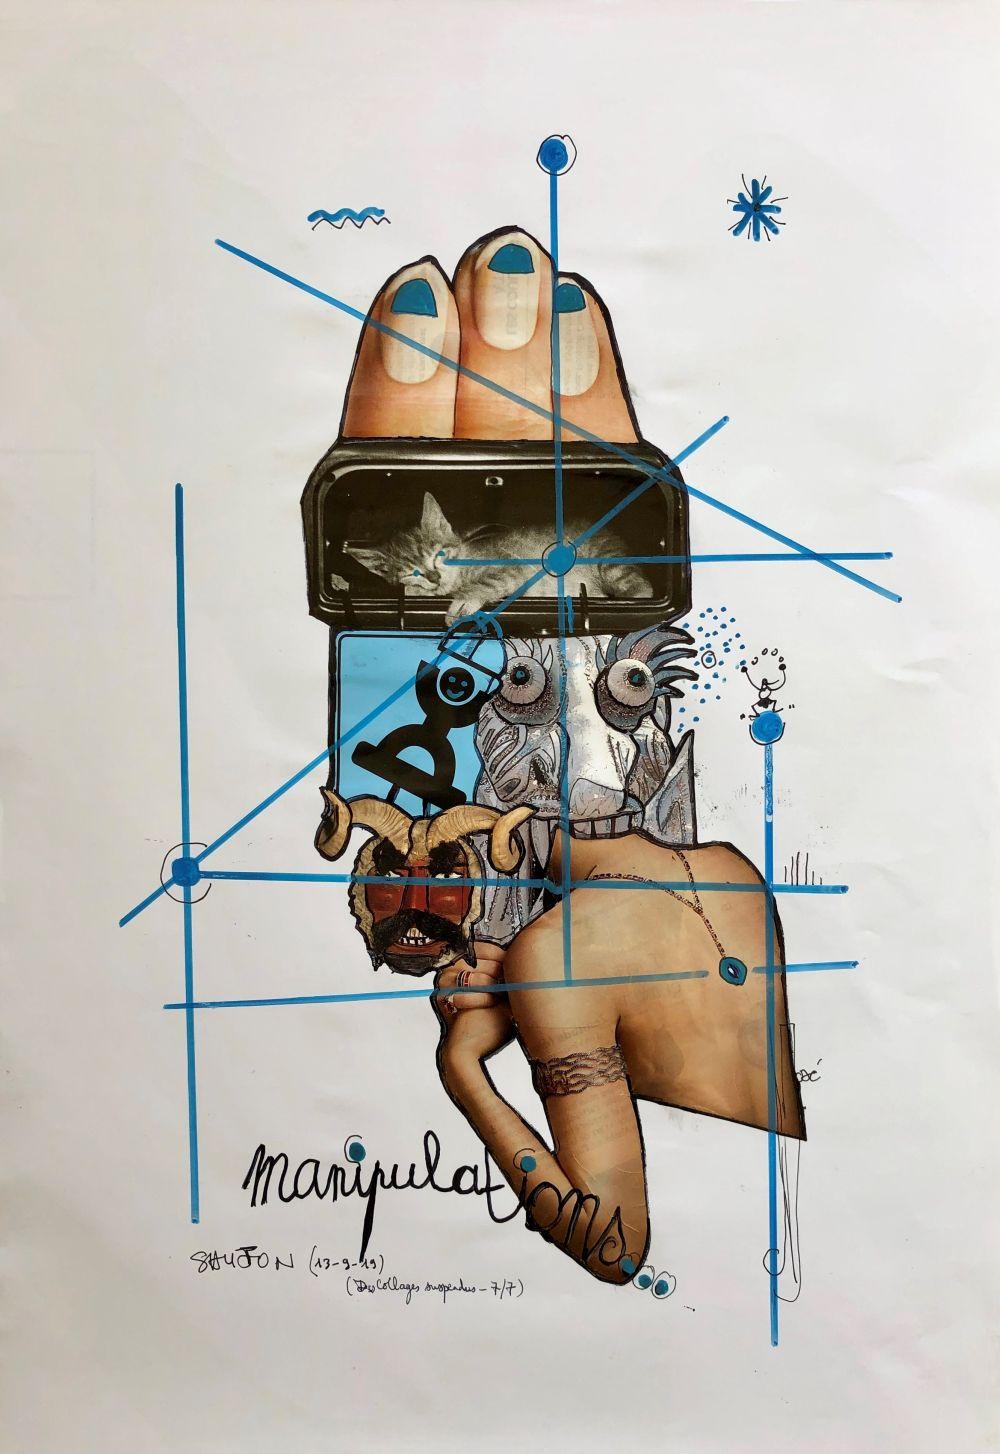 manipulations-R